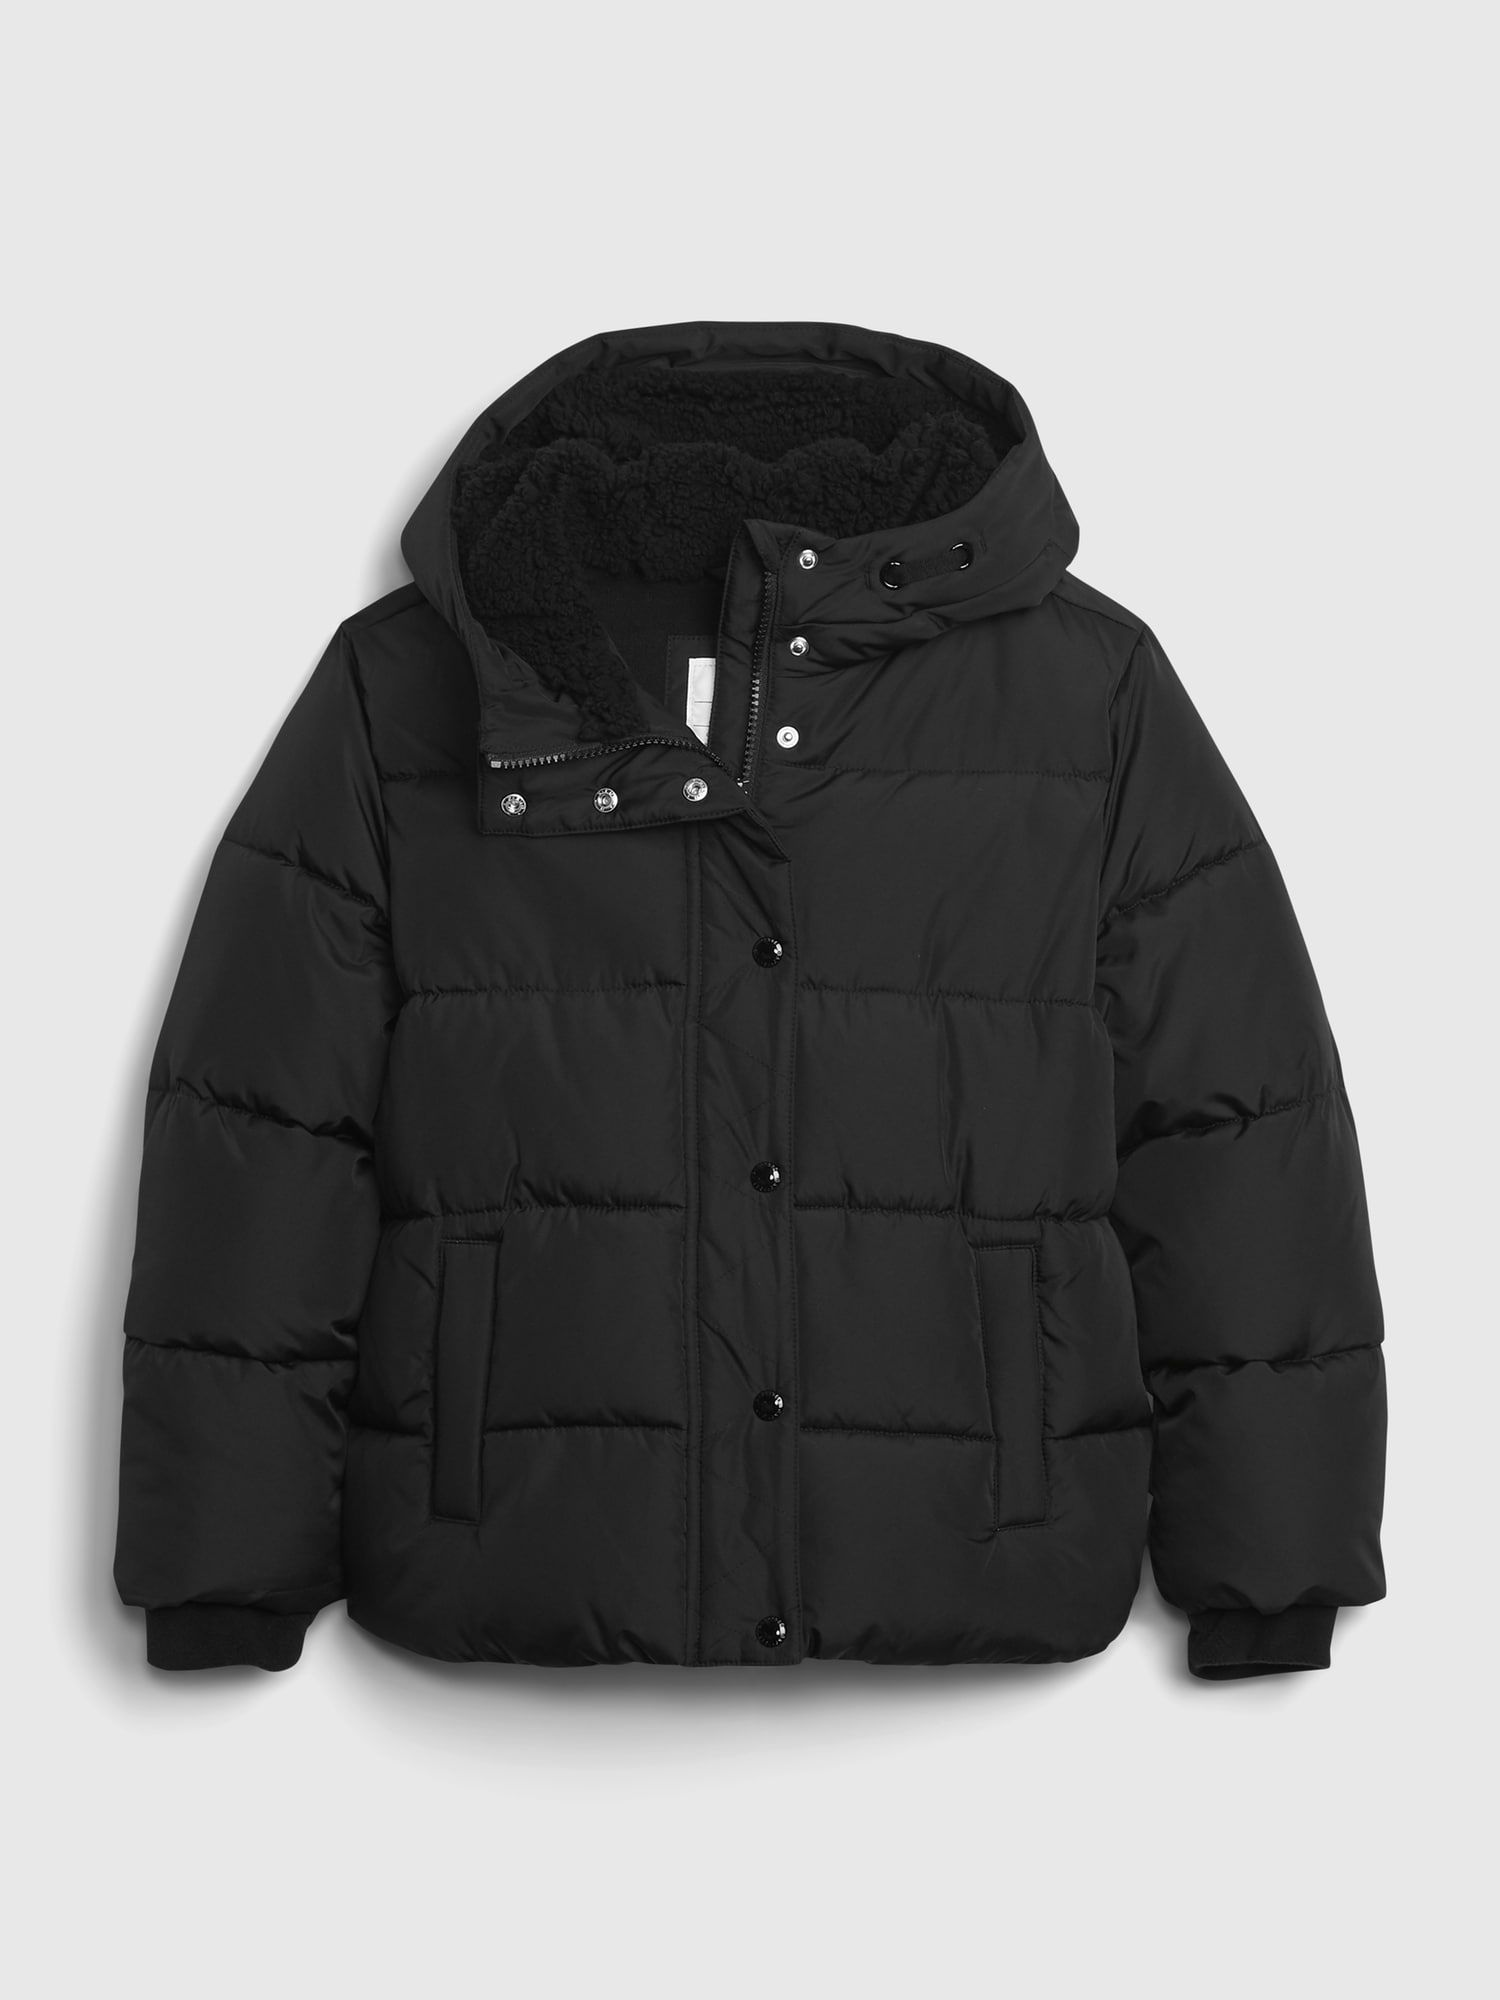 Gap Girls Coldcontrol Max Puffer Jacket Purple Rose Size Xxl In 2021 Puffer Jackets Puffer Jackets [ 2000 x 1500 Pixel ]